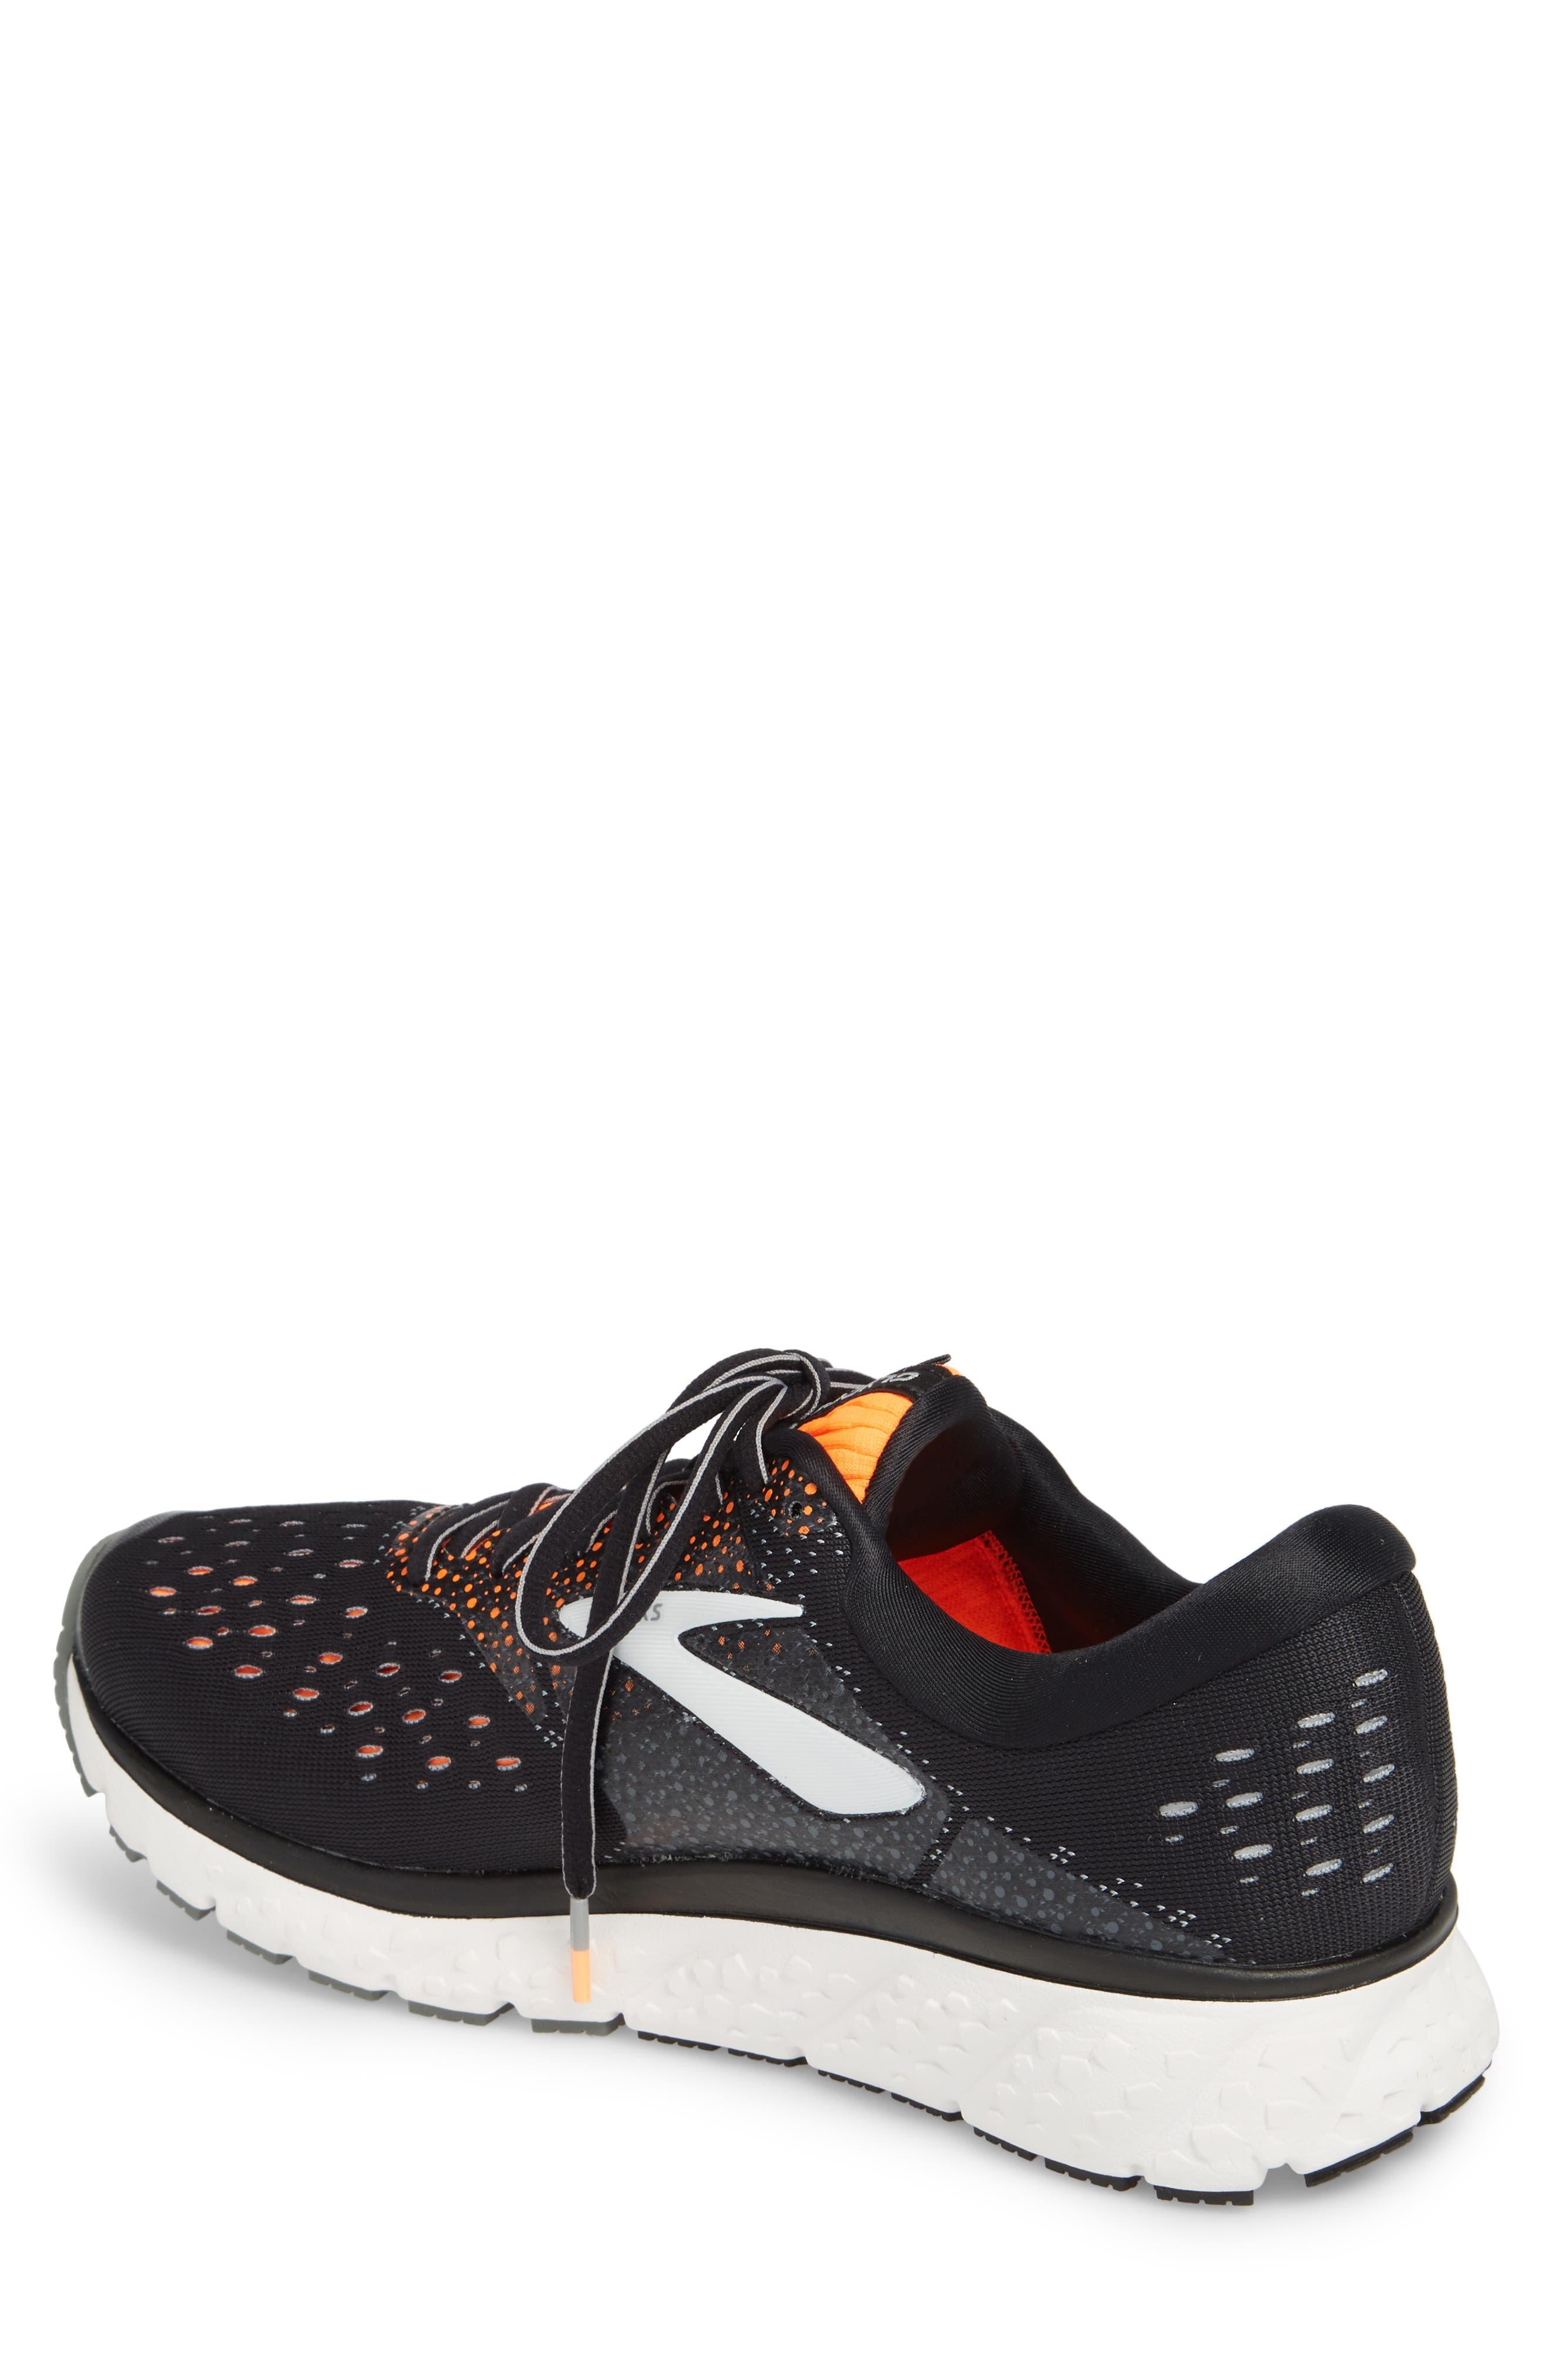 Glycerin 16 Running Shoe,                             Alternate thumbnail 2, color,                             BLACK/ ORANGE/ GREY